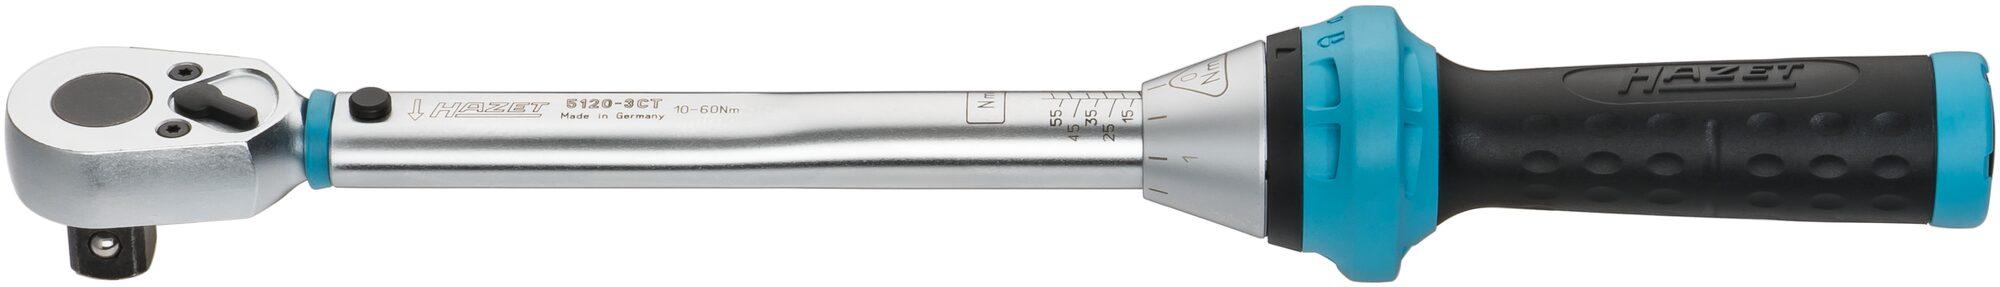 HAZET Drehmoment-Schlüssel 5120-3CT ∙ Nm min-max: 10–60 Nm ∙ Toleranz: 3% ∙ Vierkant massiv 12,5 mm (1/2 Zoll)